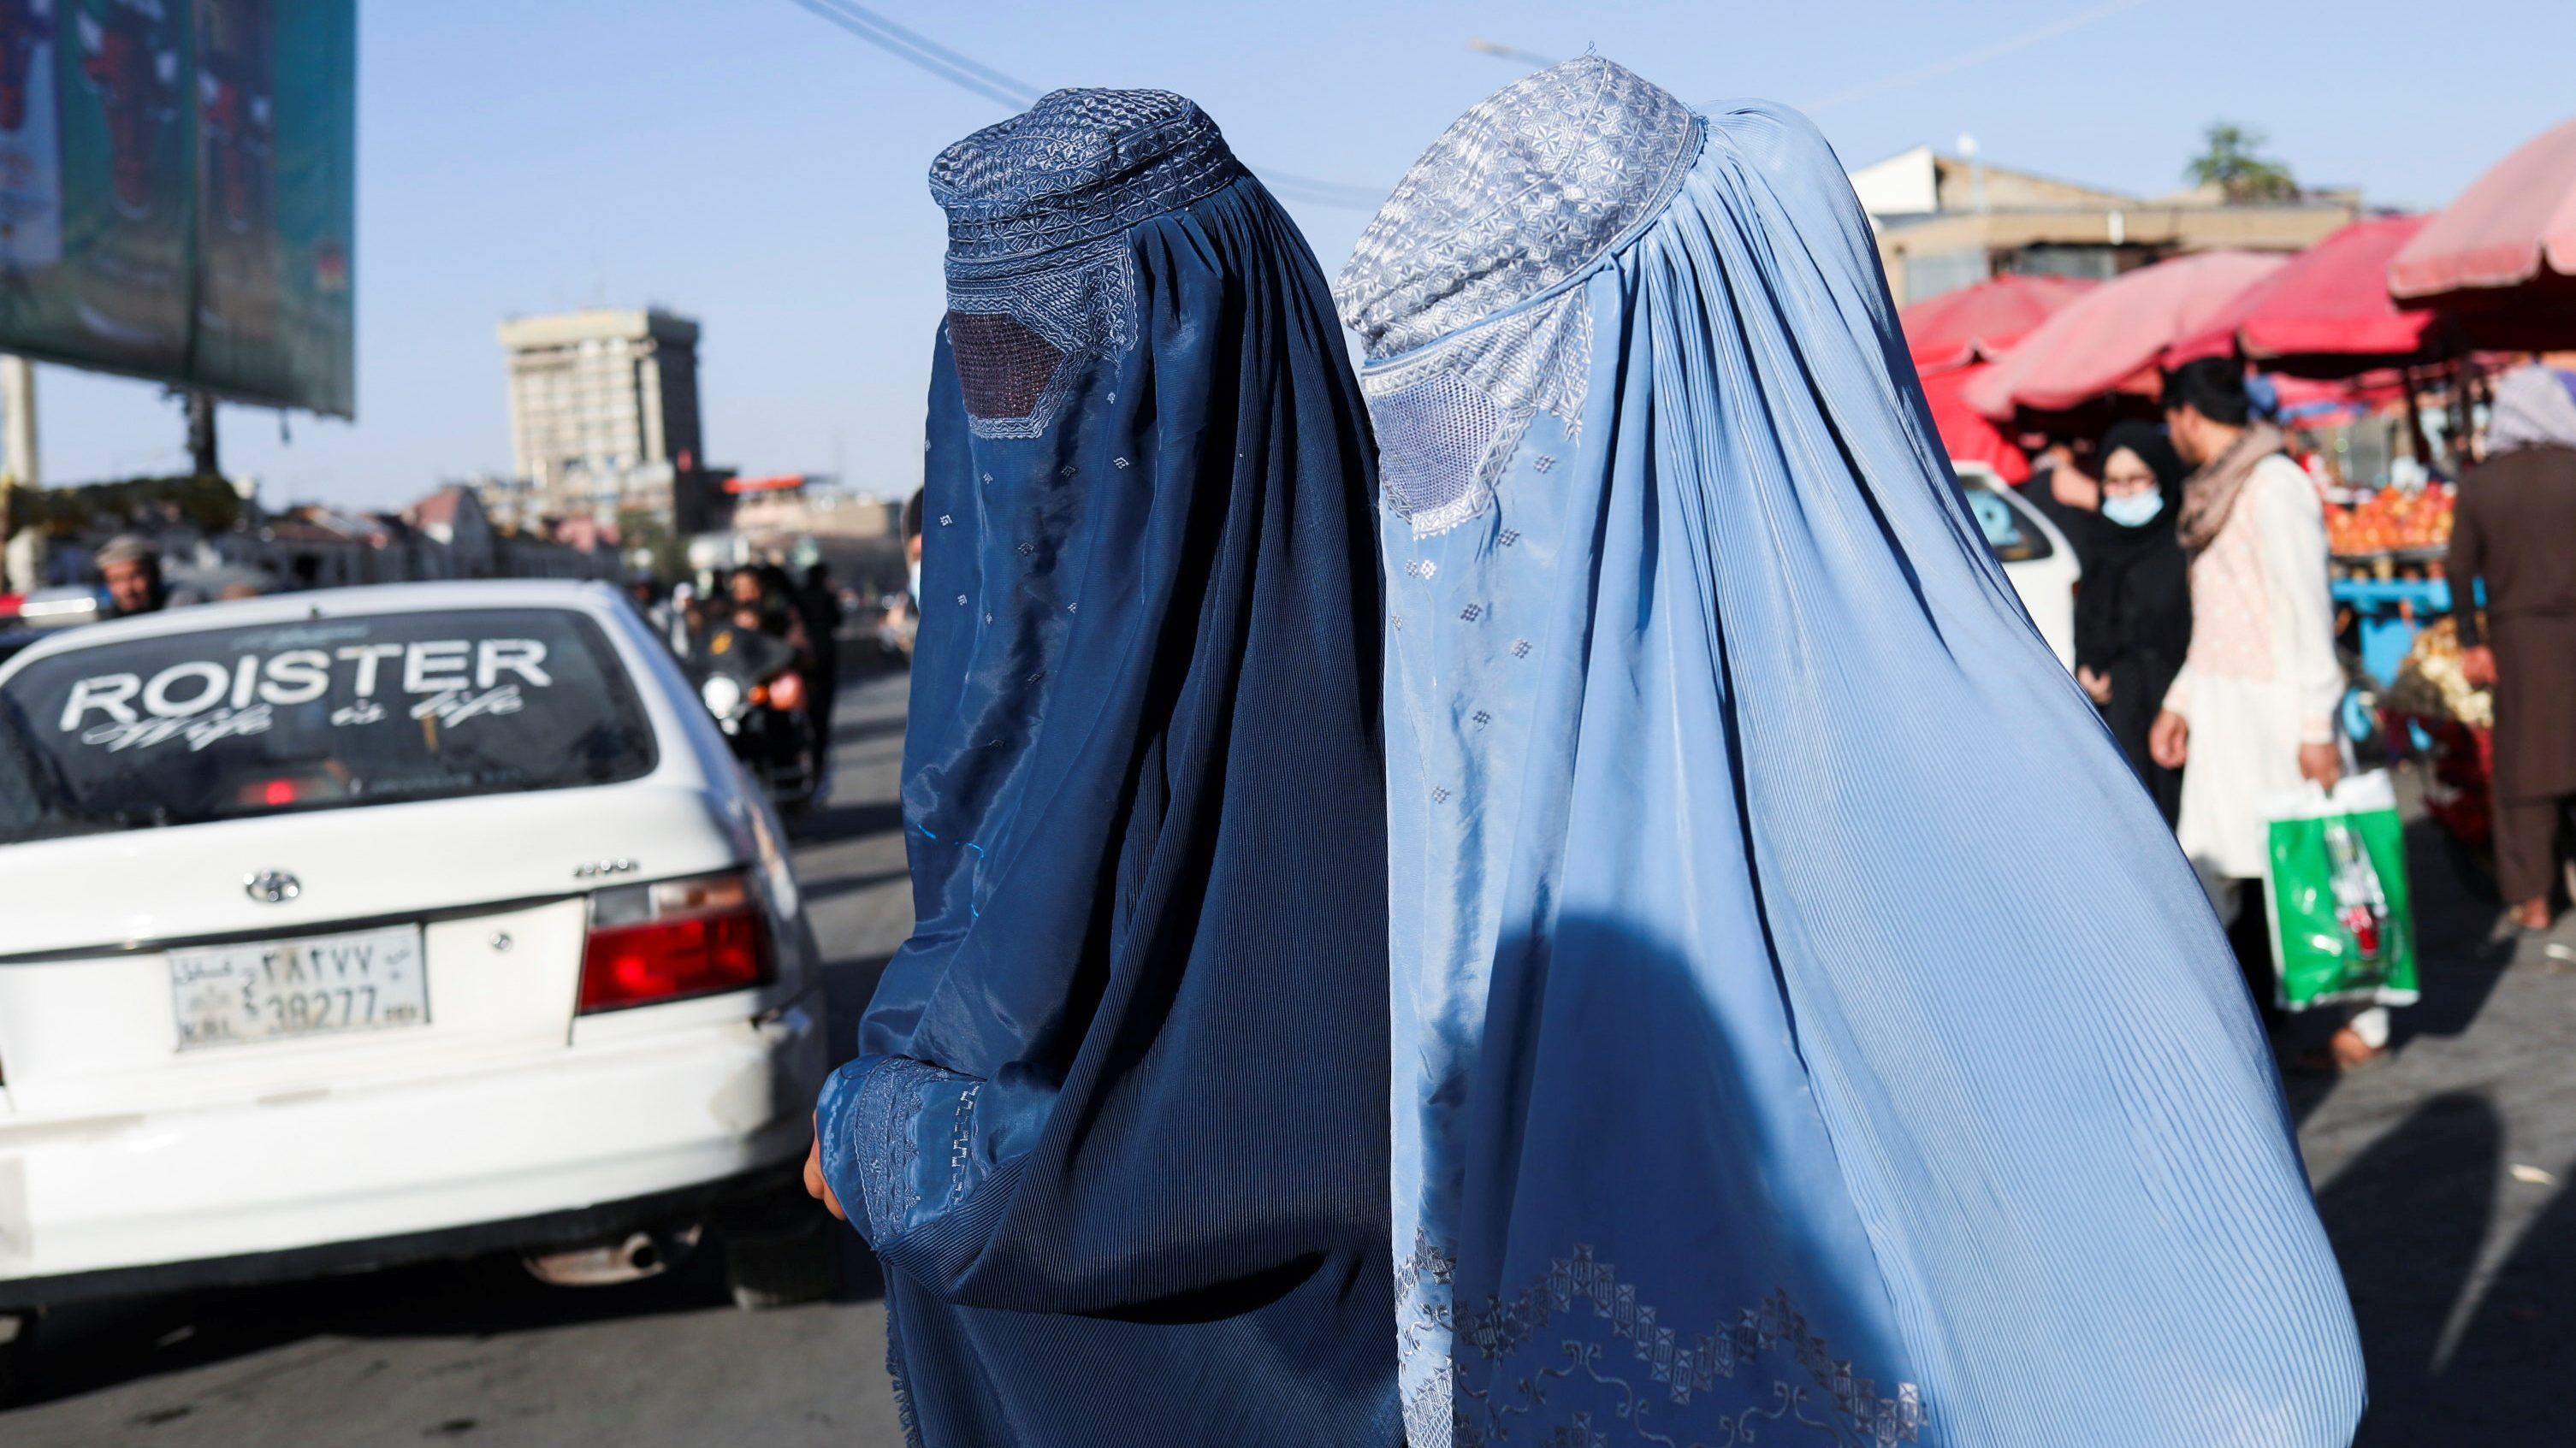 Afghan women walk down a street in Kabul